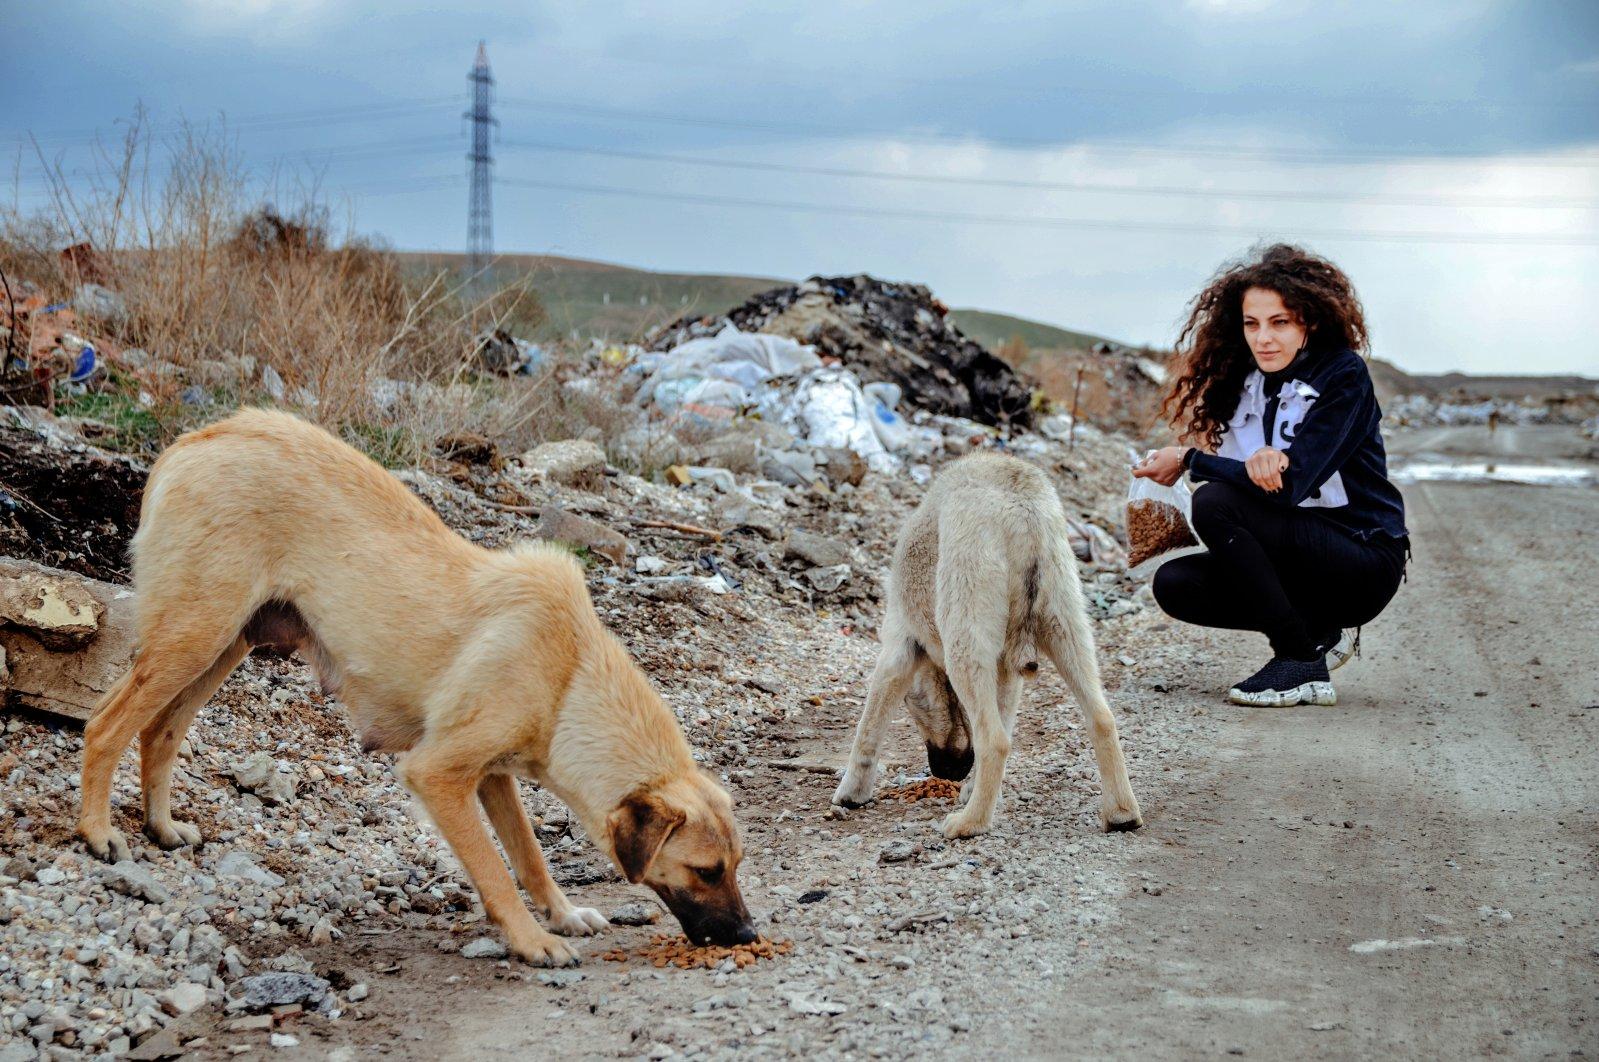 Painter Şeyma Kayan feeds stray dogs in central Konya, Turkey, April 13, 2021. (AA Photo)